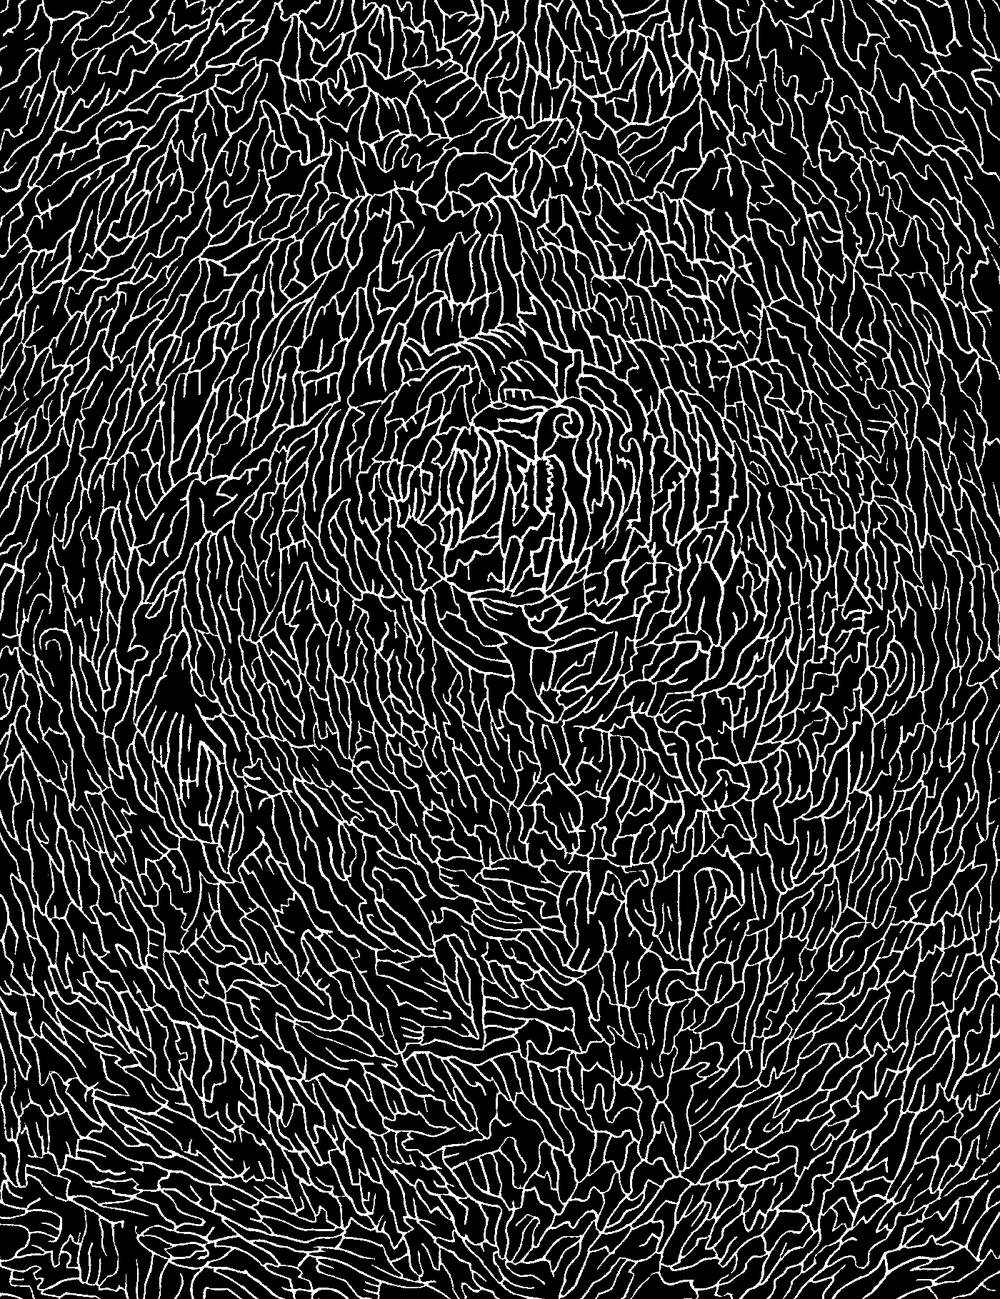 InkSketch4.png